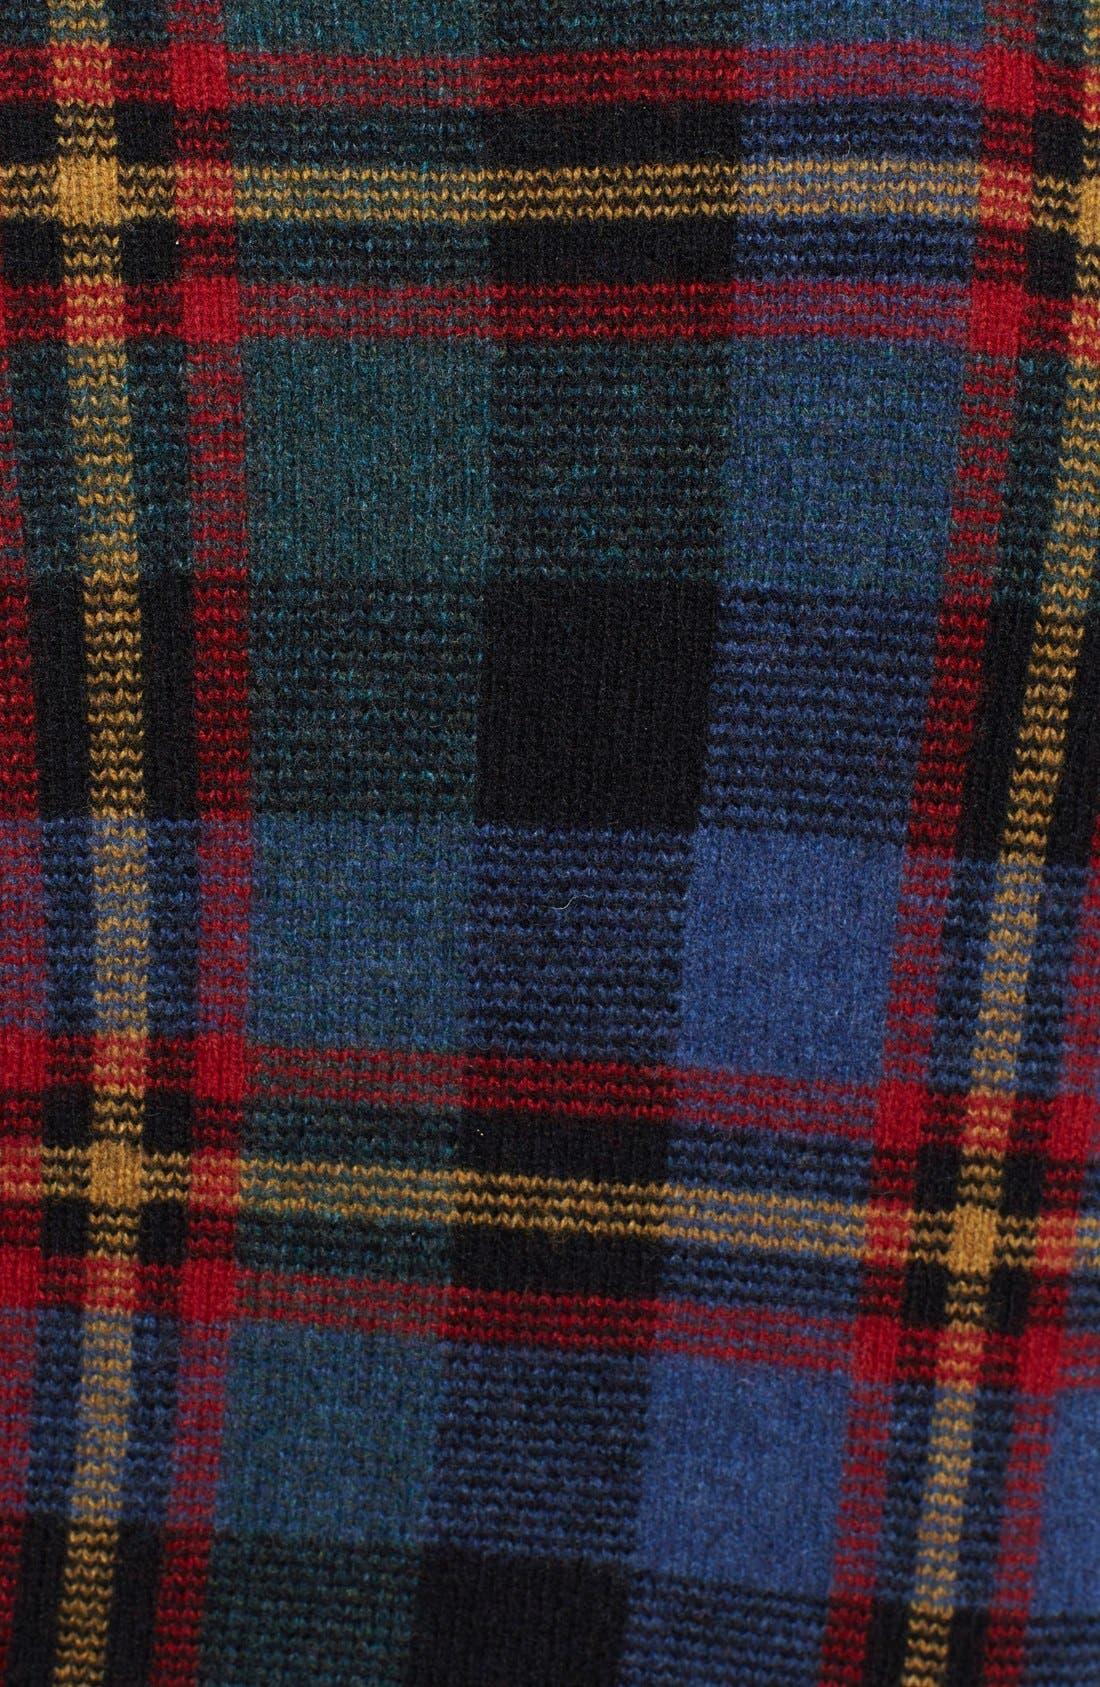 POLO RALPH LAUREN,                             Plaid Shawl Collar Wool Sweater,                             Alternate thumbnail 4, color,                             420